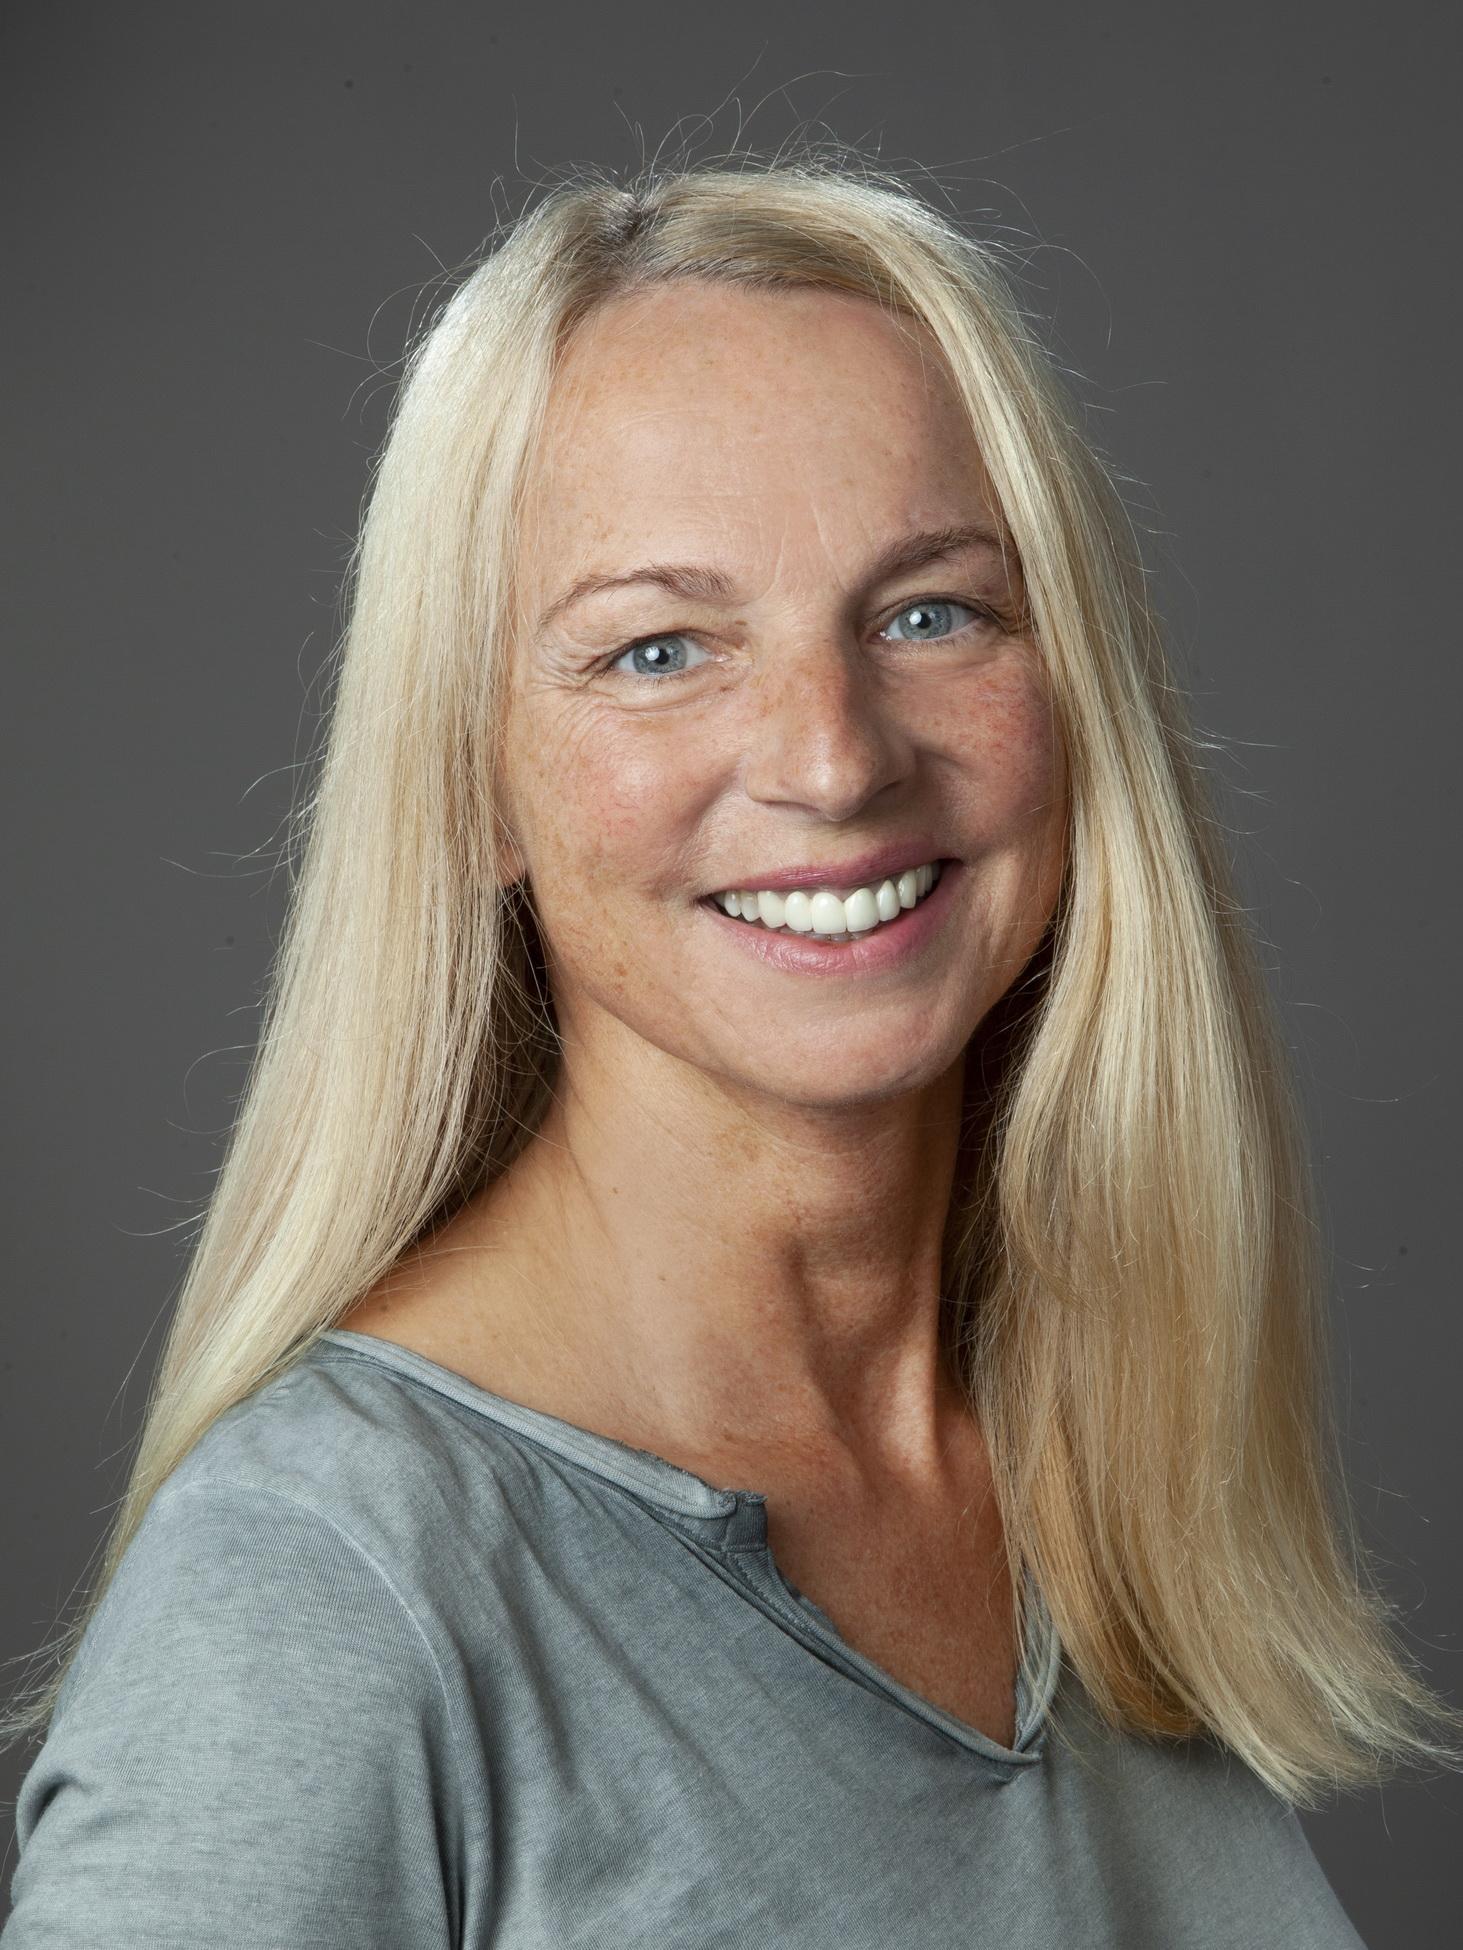 Fotografenmeisterin Astrid Poeppel